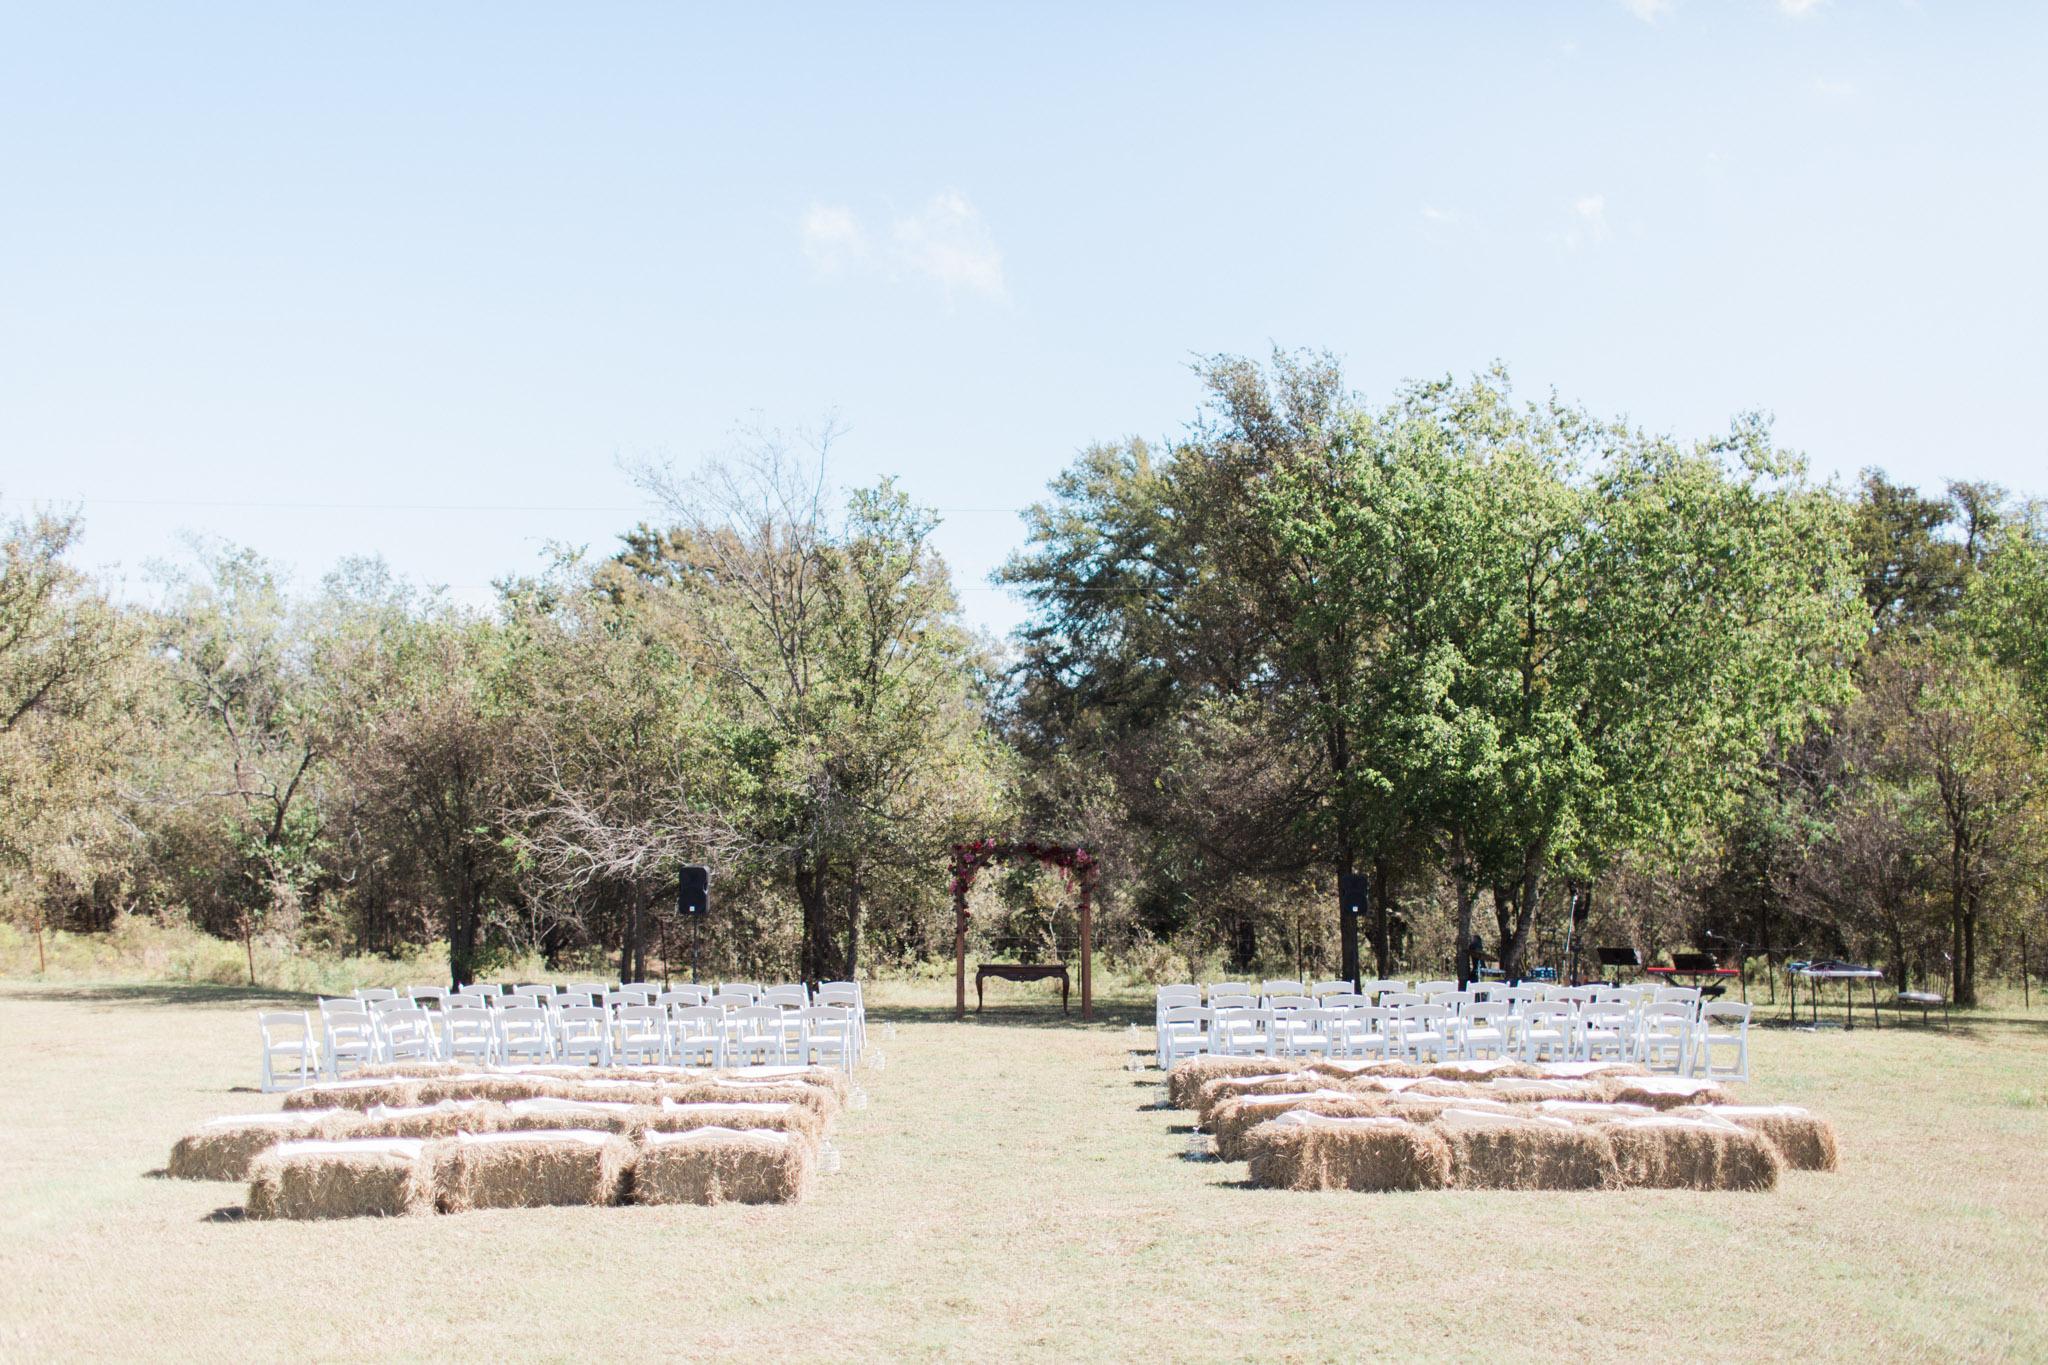 sanger_texas_wedding_photographer-12.jpg